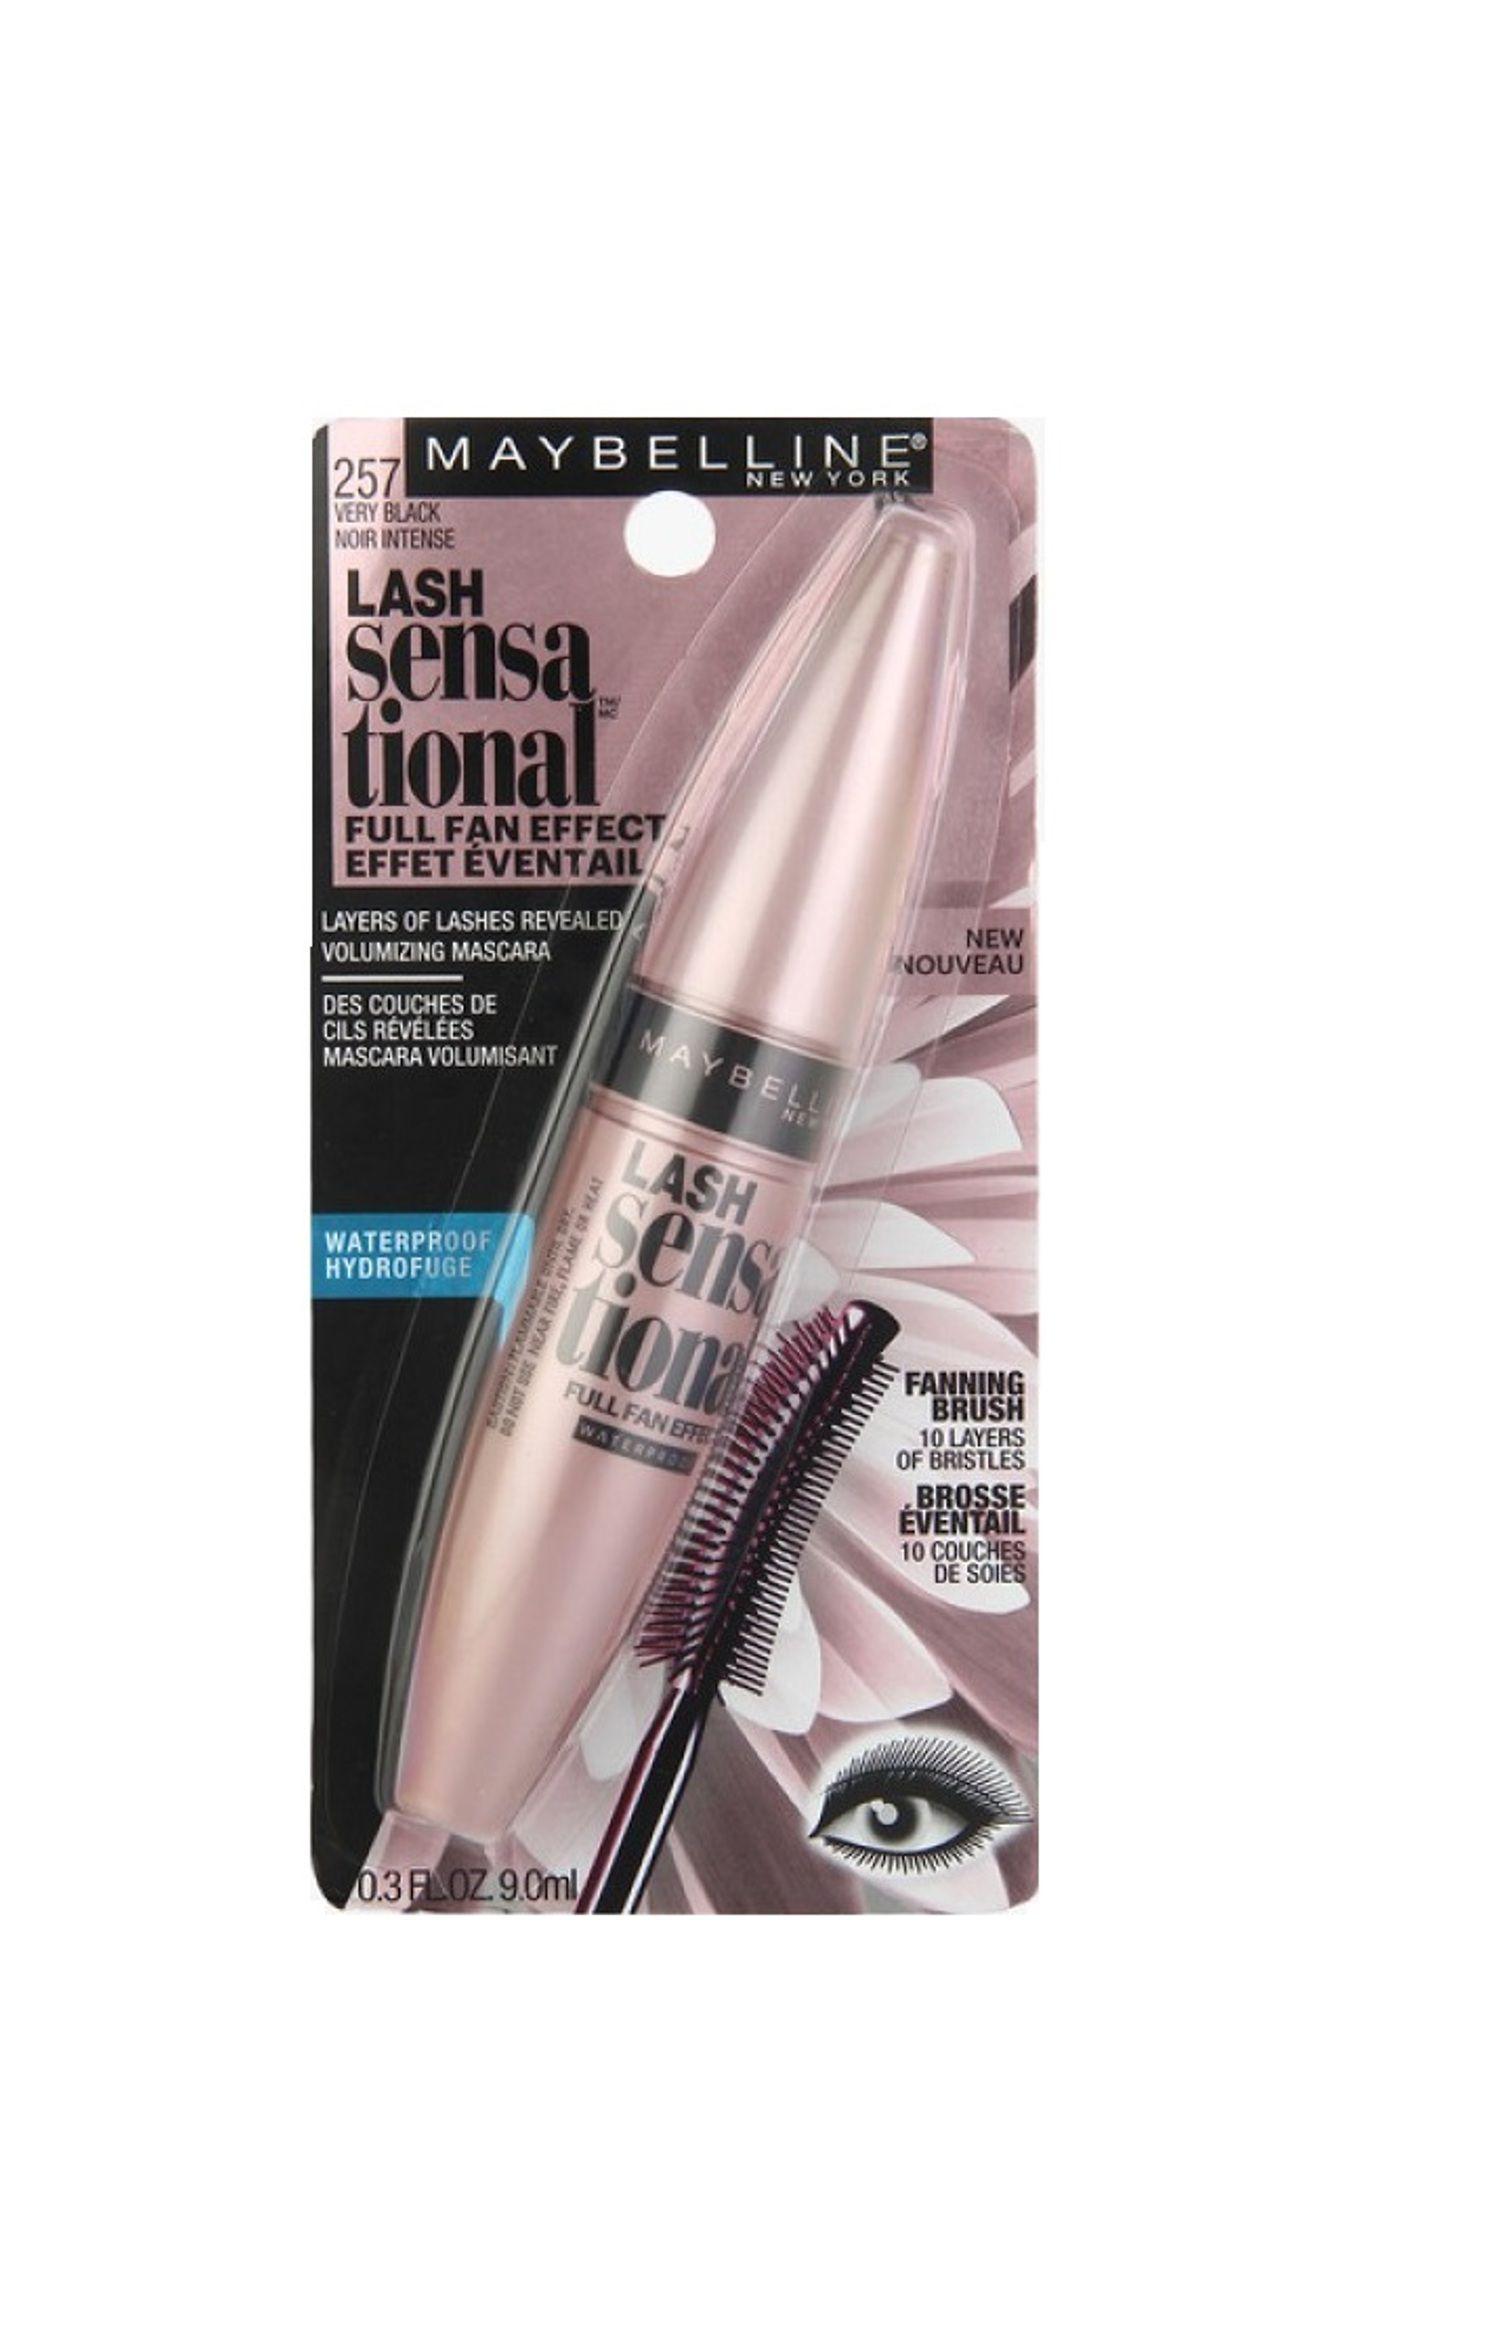 a7ca497111a Maybelline Lash Sensational Mascara 257 Very Black 257 Very Black Noir  Intense 9 ml: Buy Maybelline Lash Sensational Mascara 257 Very Black 257  Very Black ...